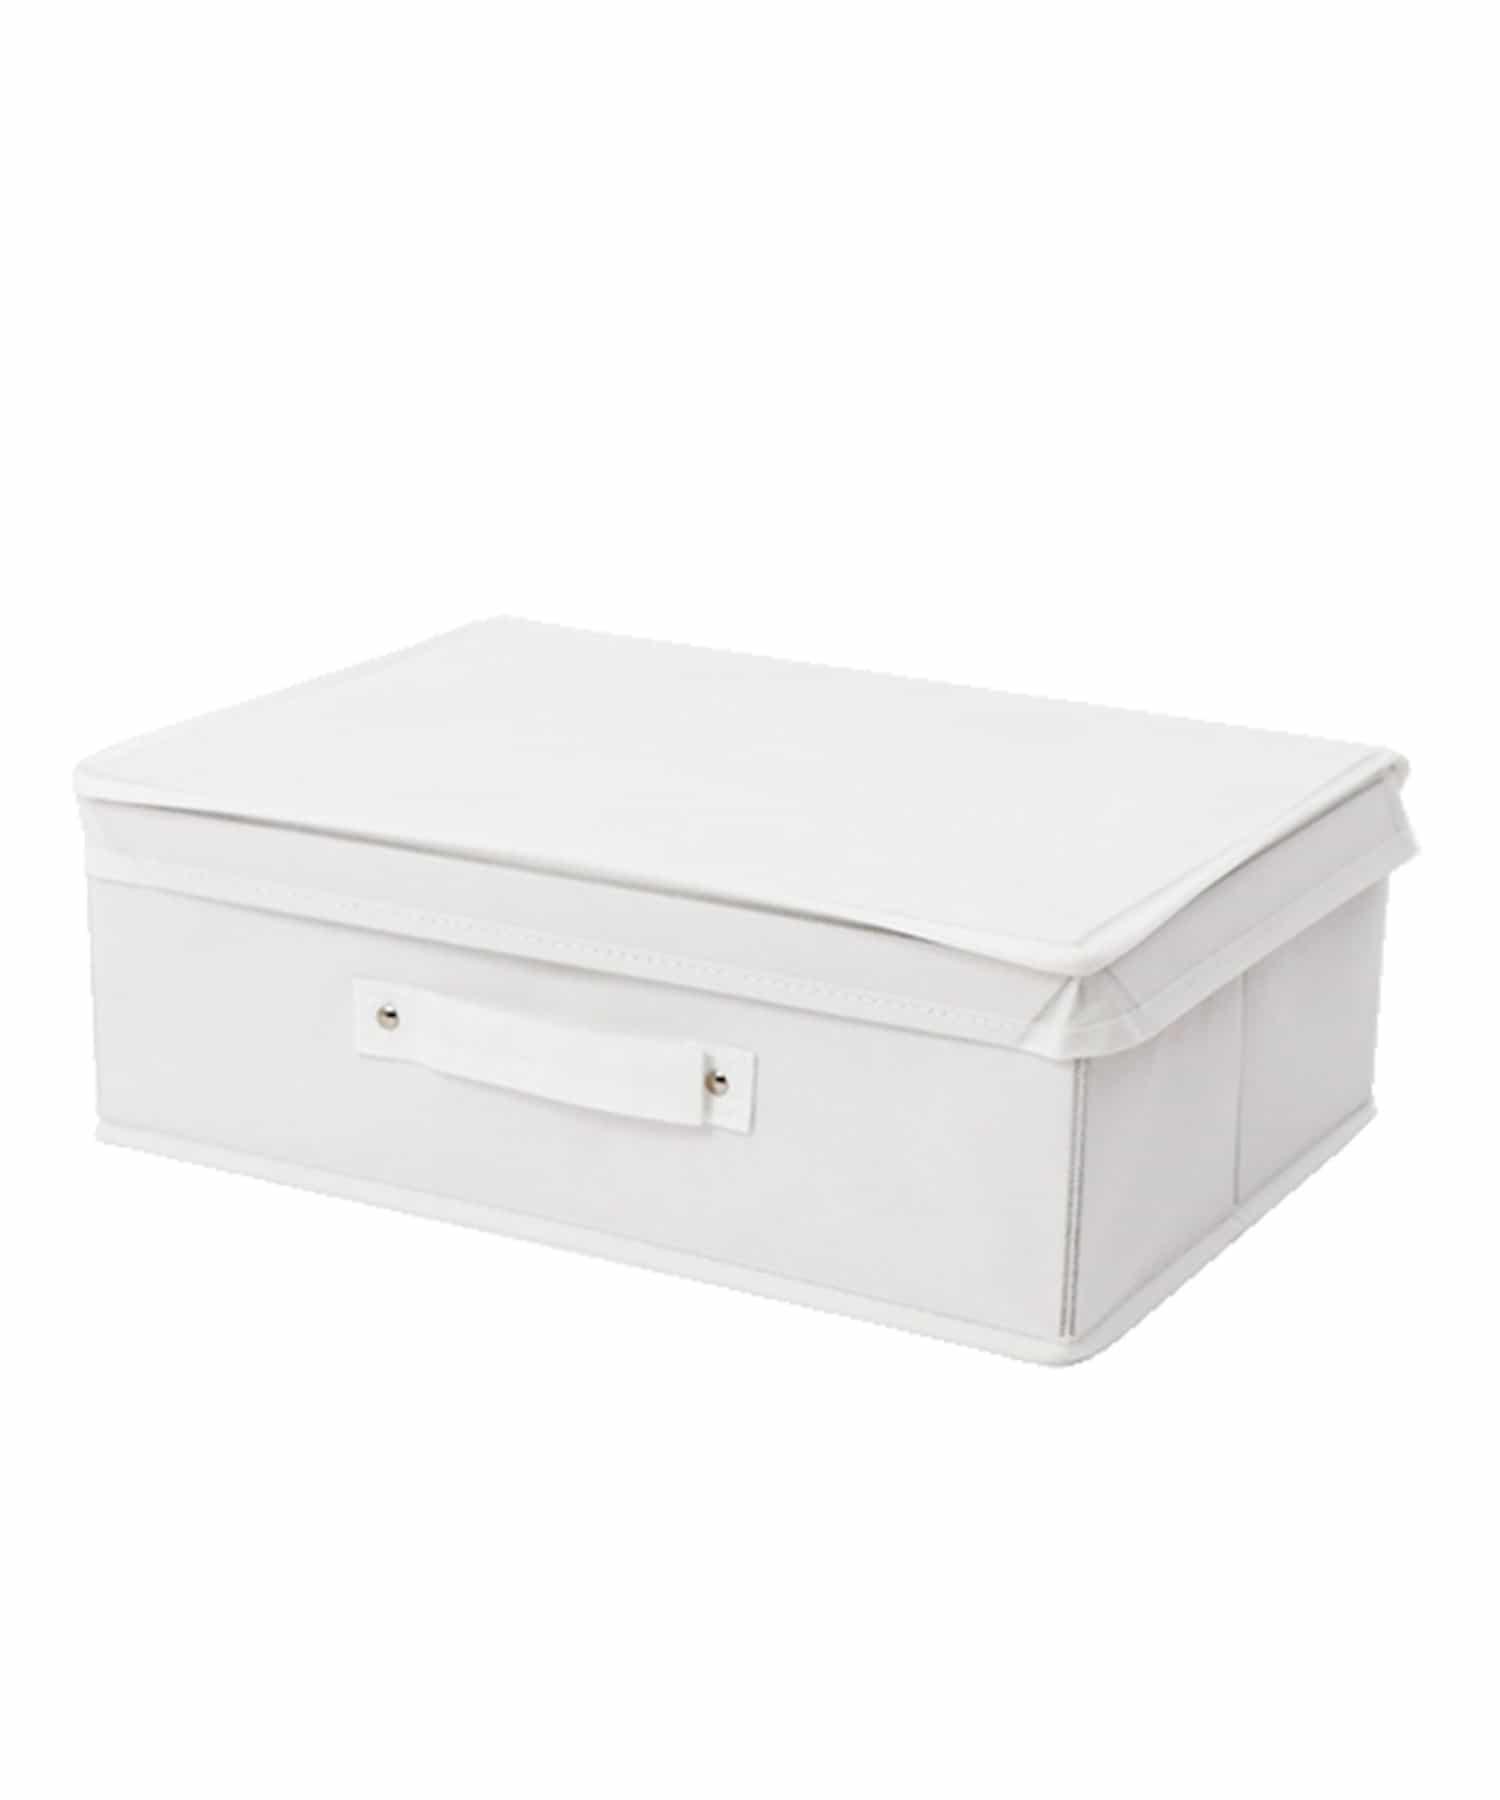 3COINS(スリーコインズ) ライフスタイル フタ付フラットボックス ホワイト